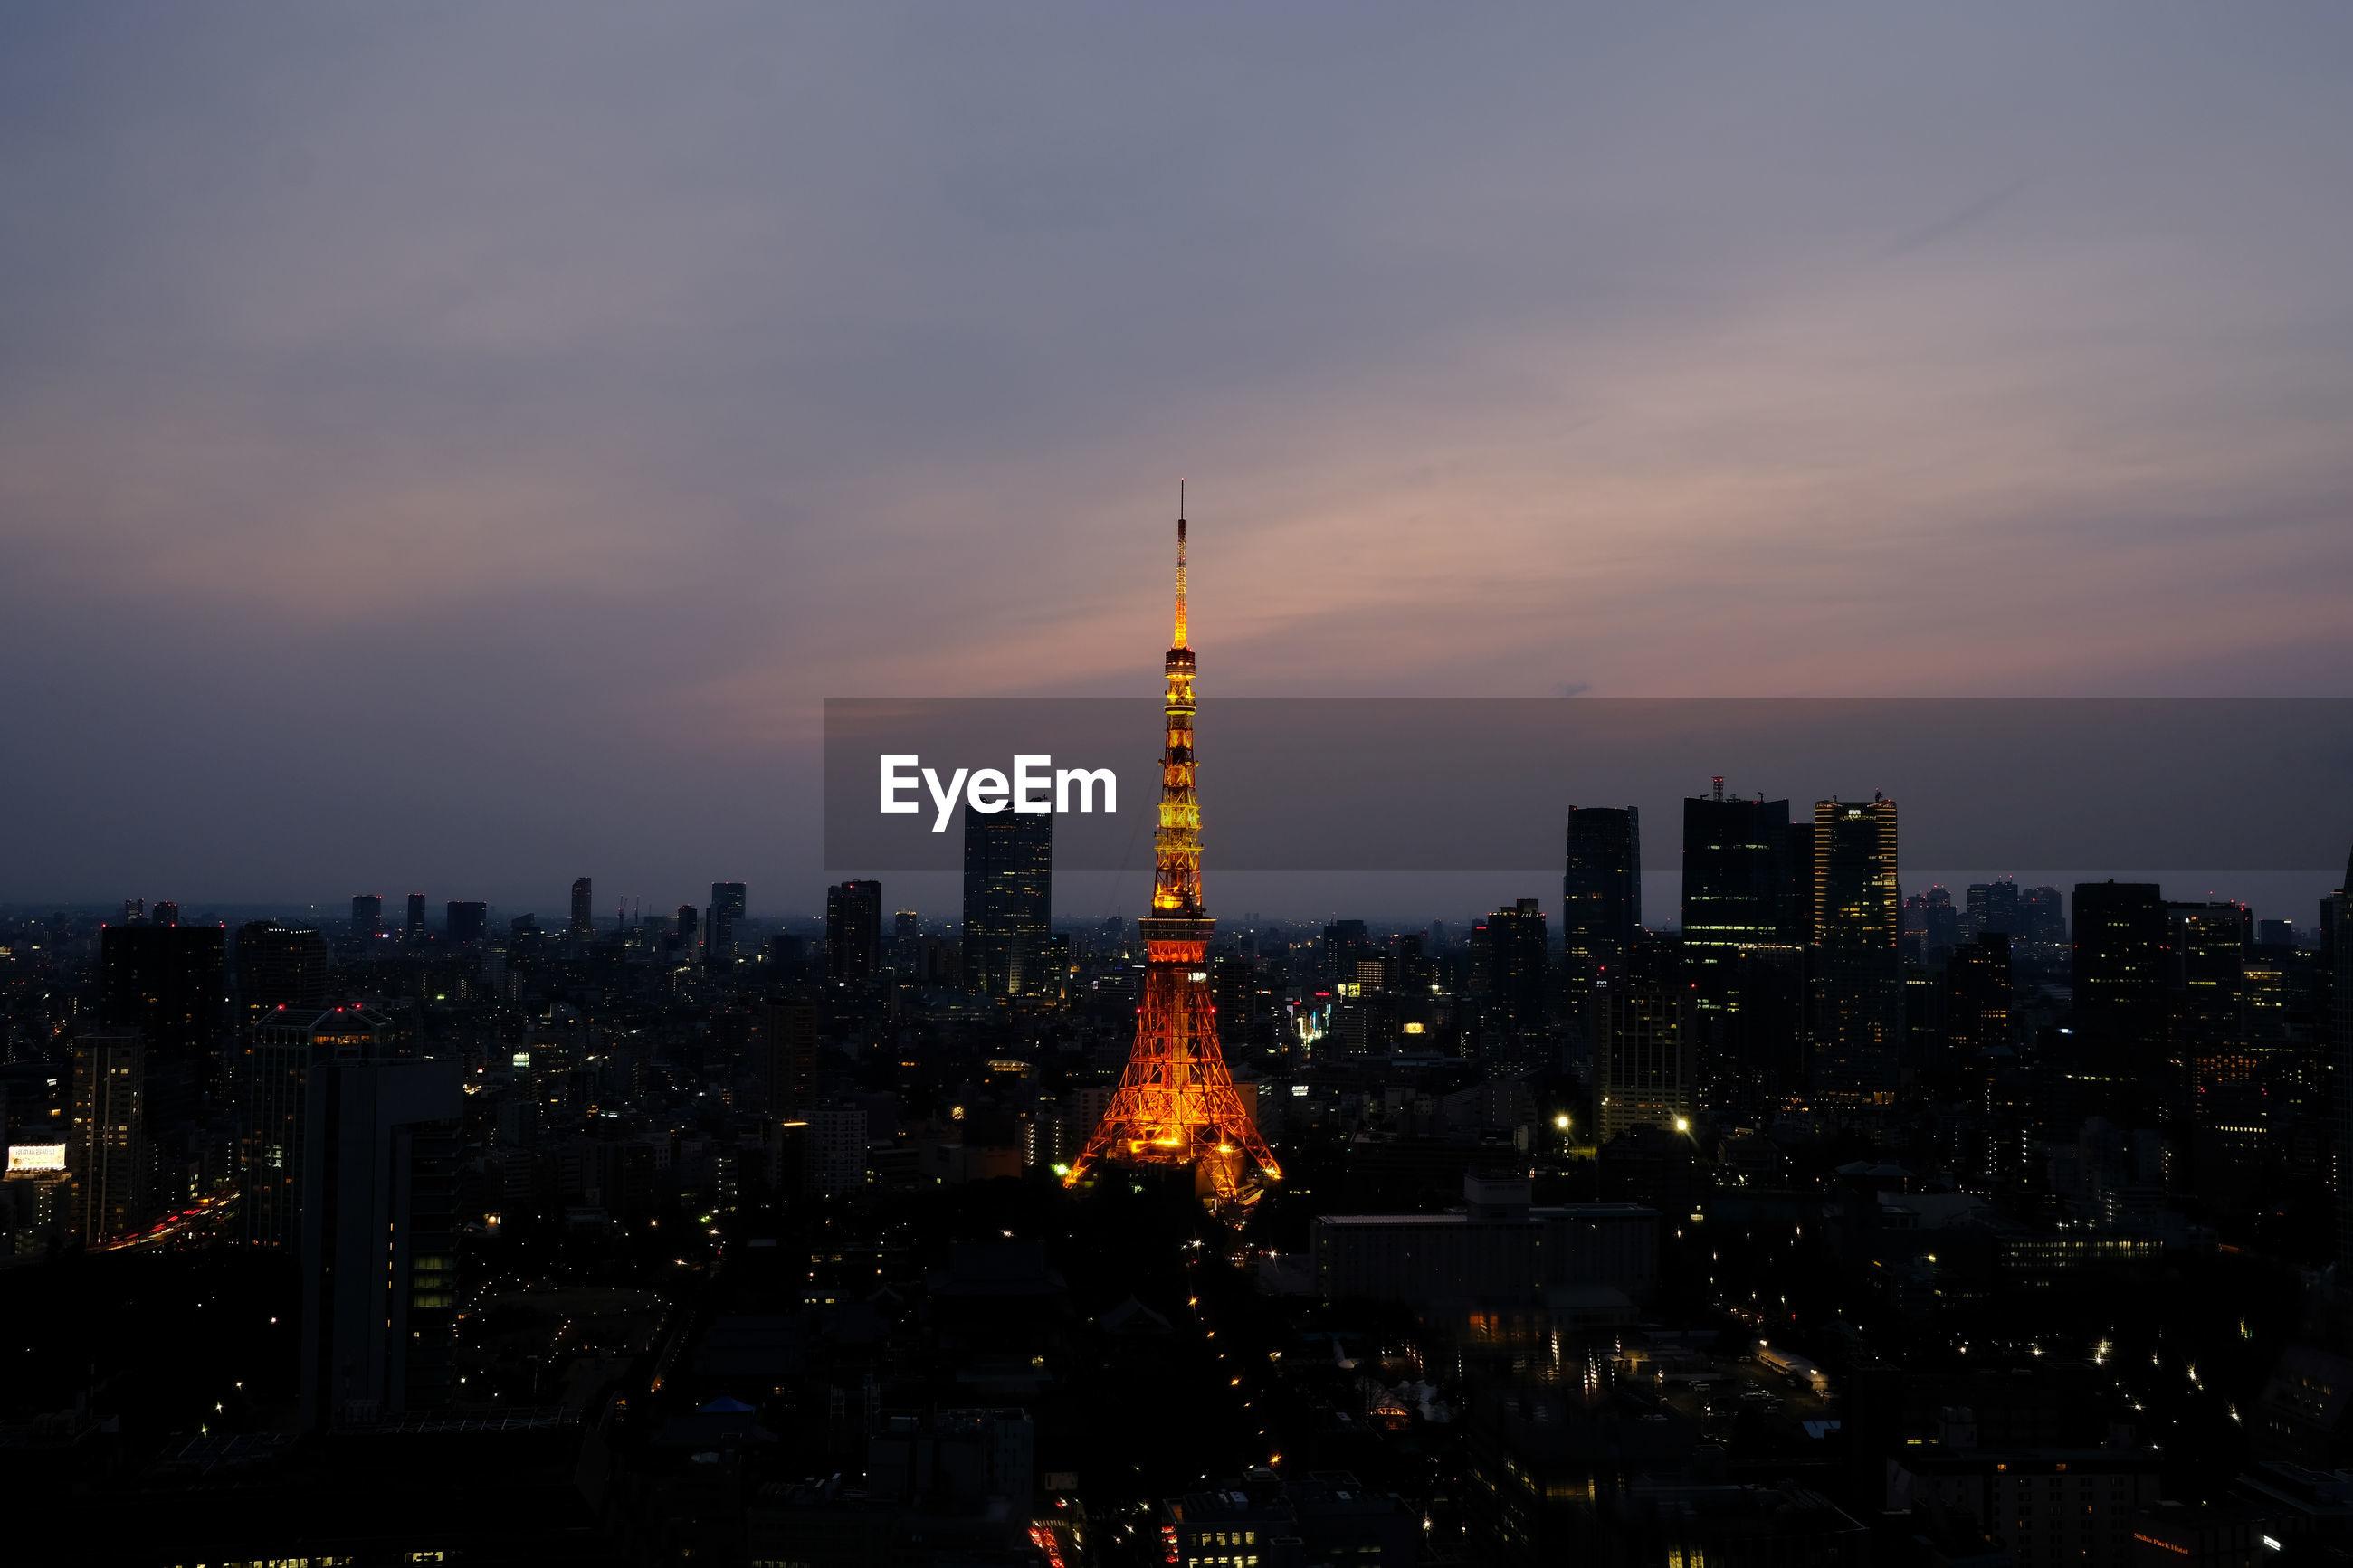 VIEW OF CITY AT NIGHT